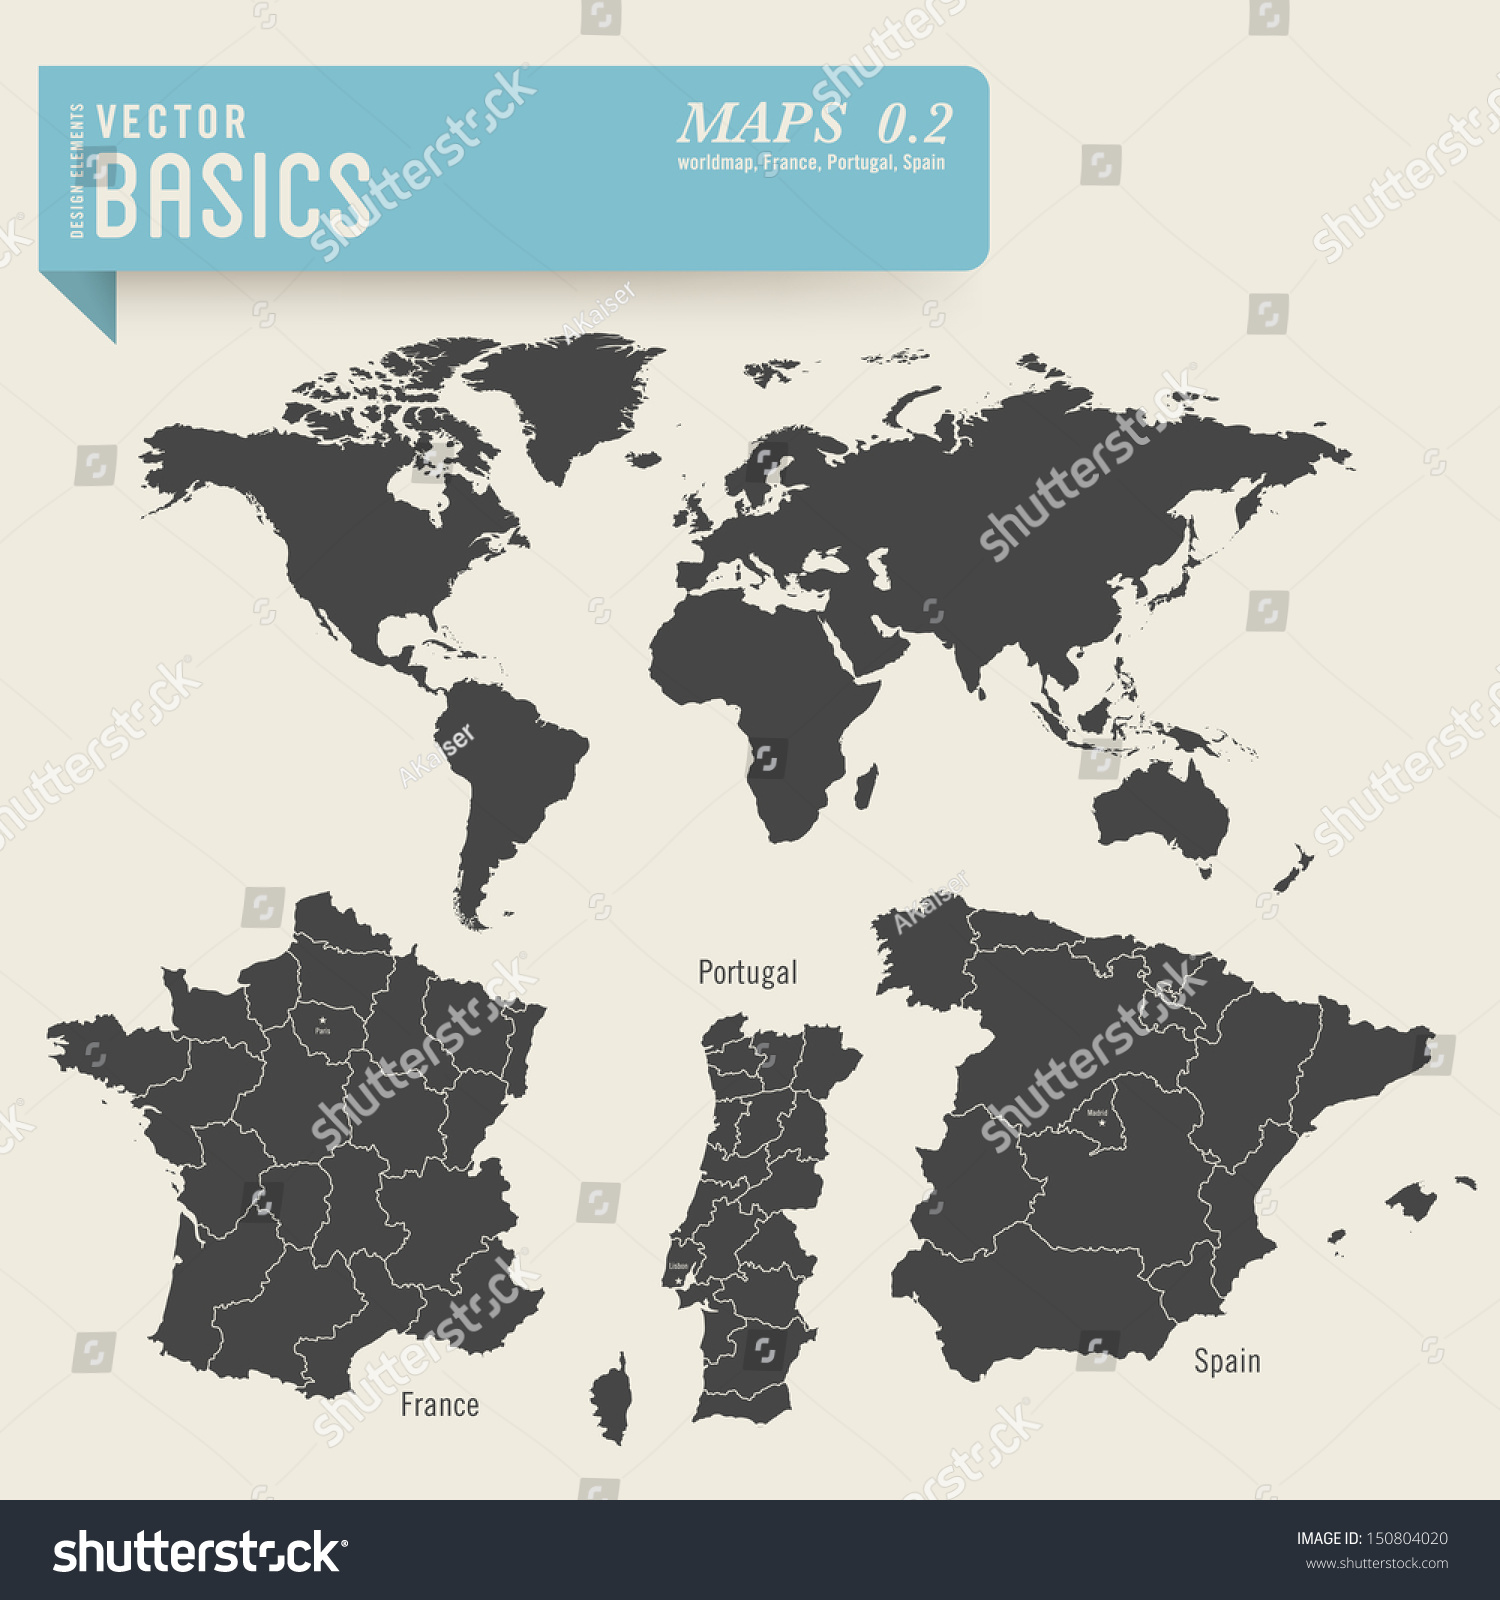 Image of: Vector Basics Worldmap Detailed Maps France Stock Vector Royalty Free 150804020